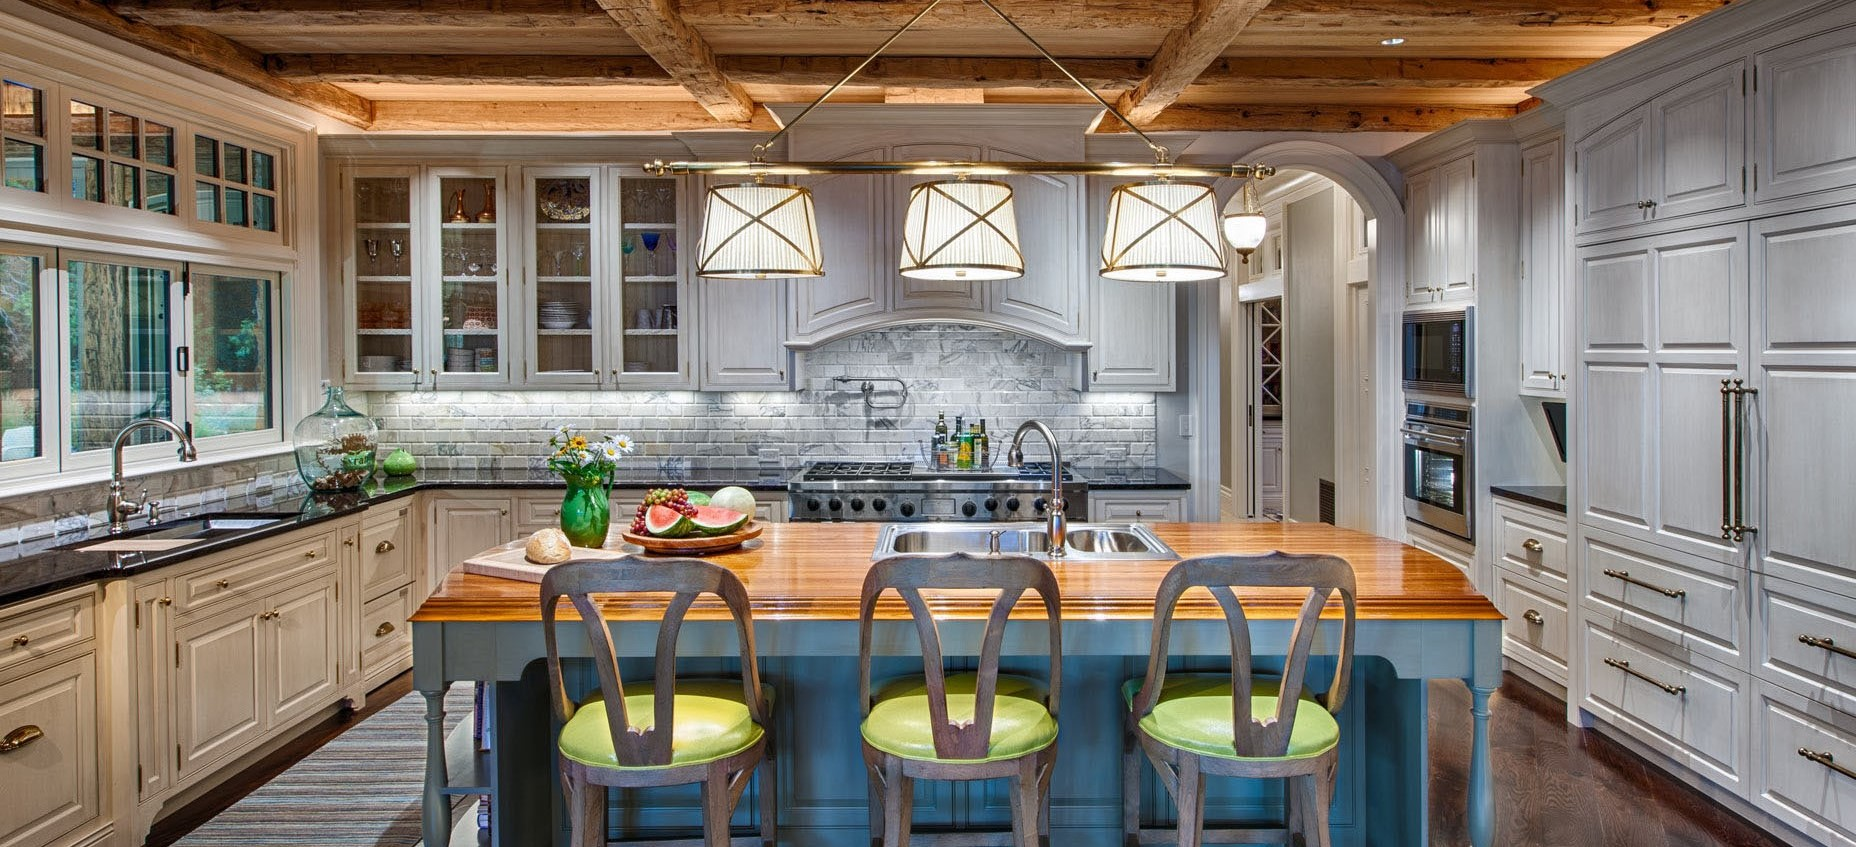 WINTERS, CARMEN: MW_Interior-Kitchen-DUP1.jpg